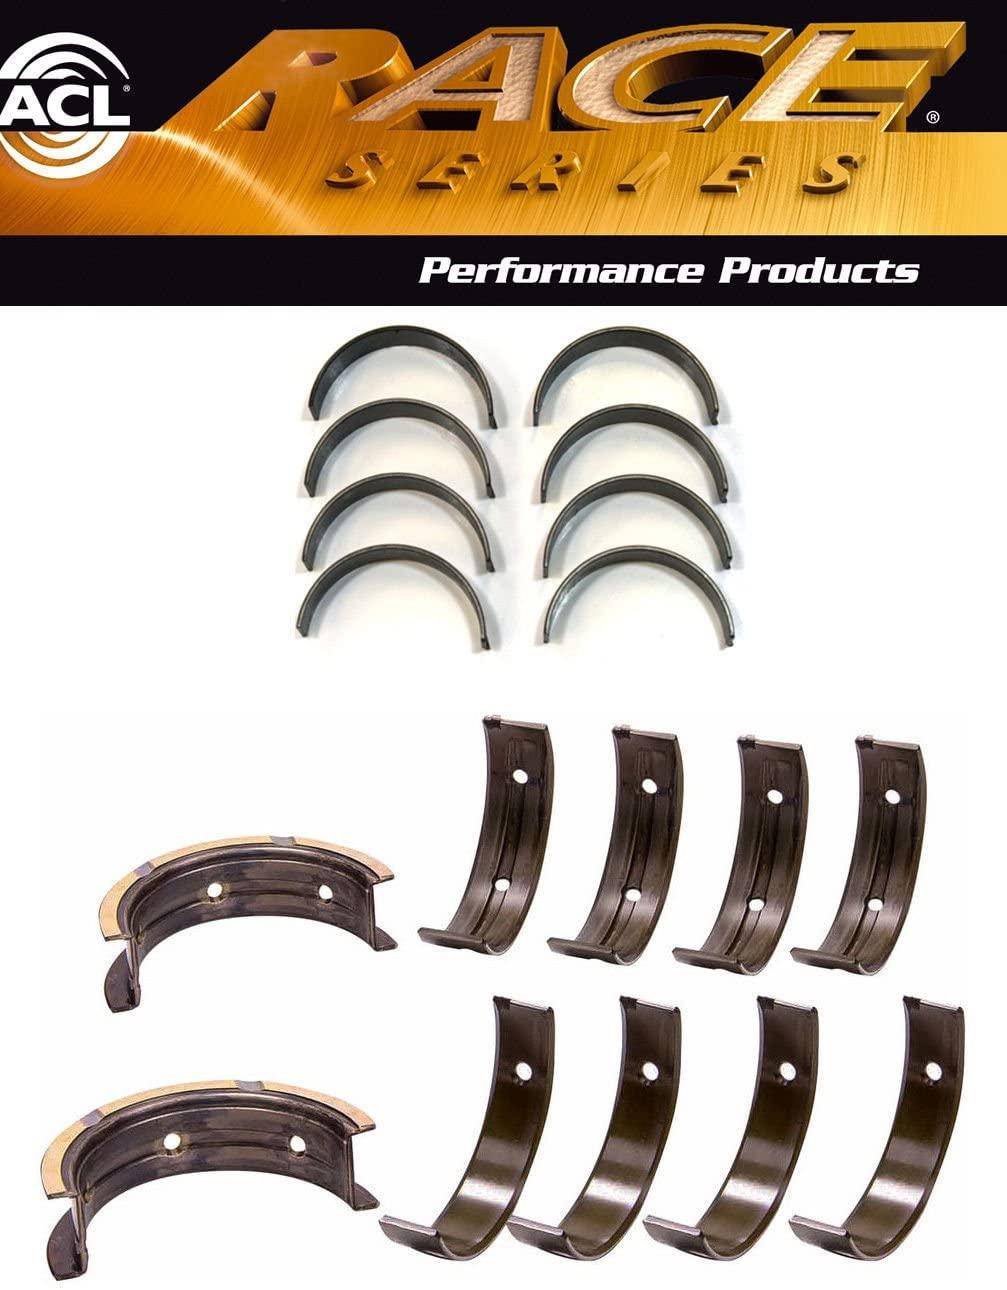 ACL Race Rod+Main Bearings for Subaru WRX STi EJ20 EJ25 w/52mm+#5 thrust STD (STD Sizes)